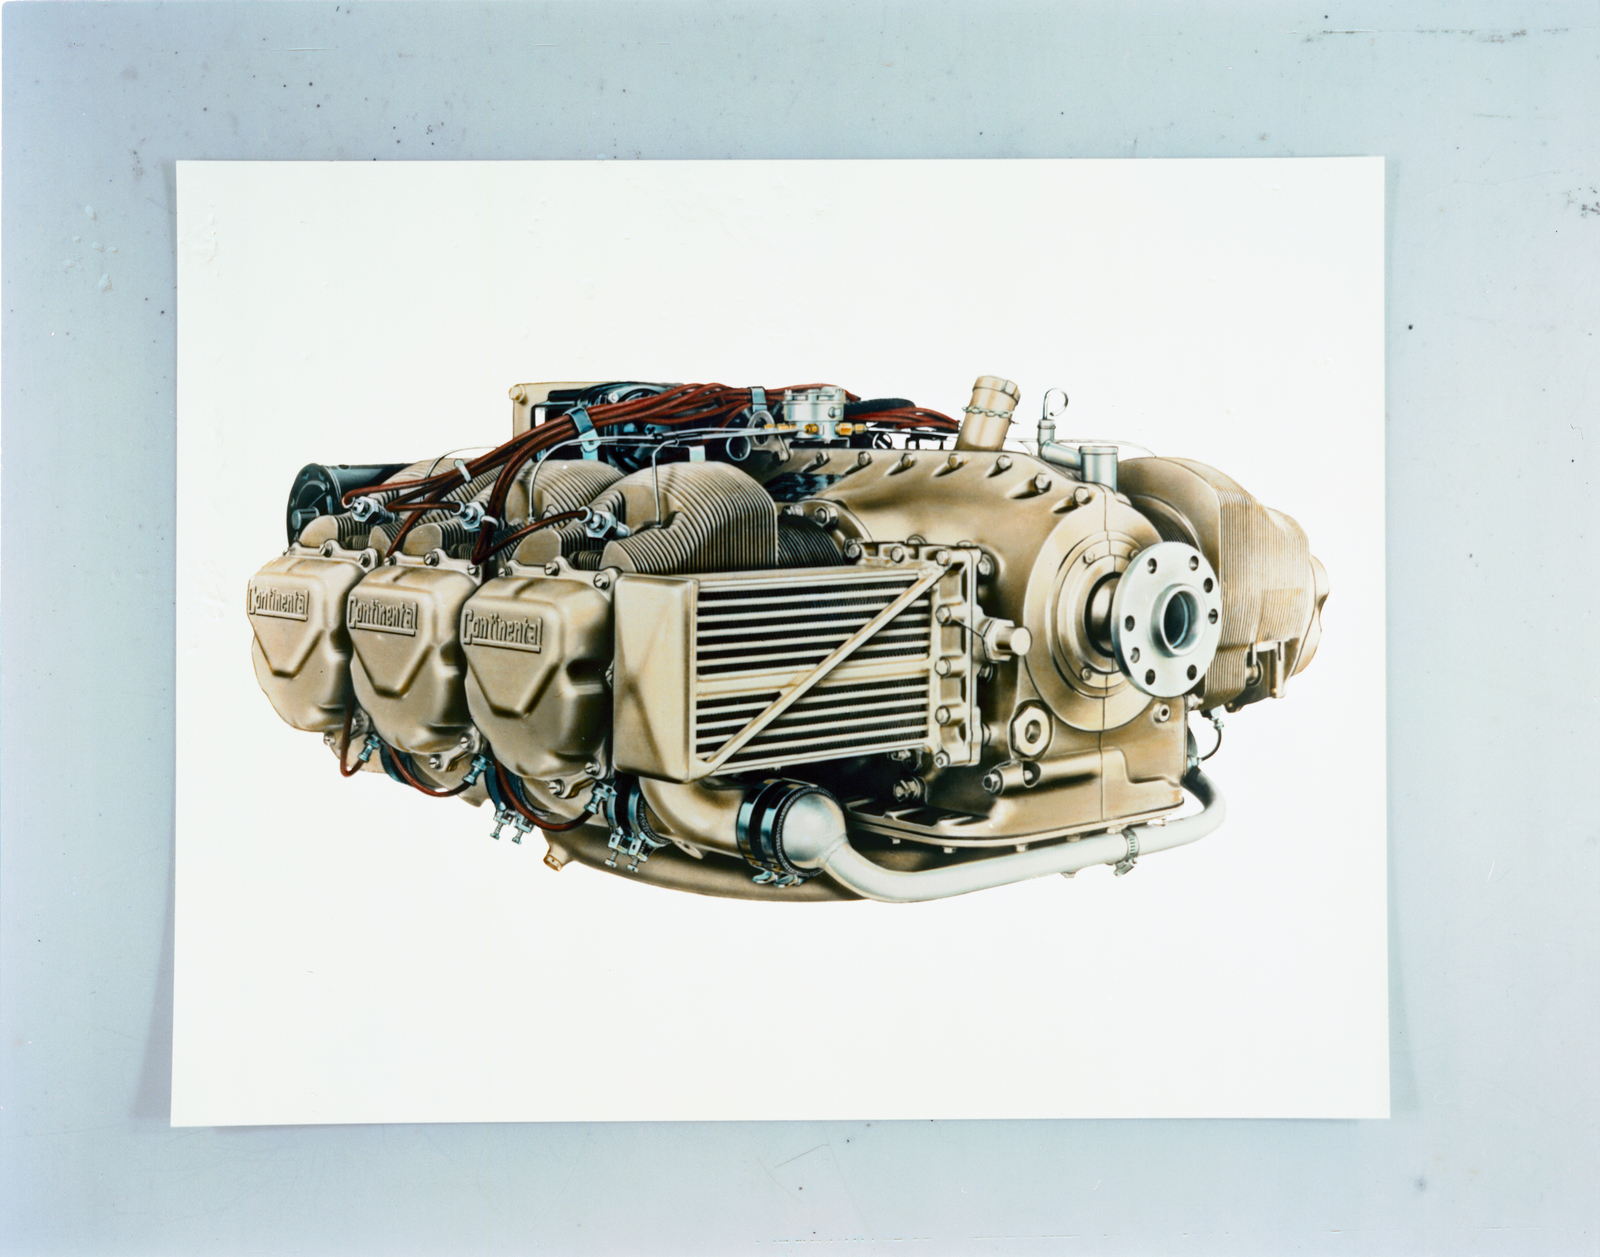 Teledyne Engine